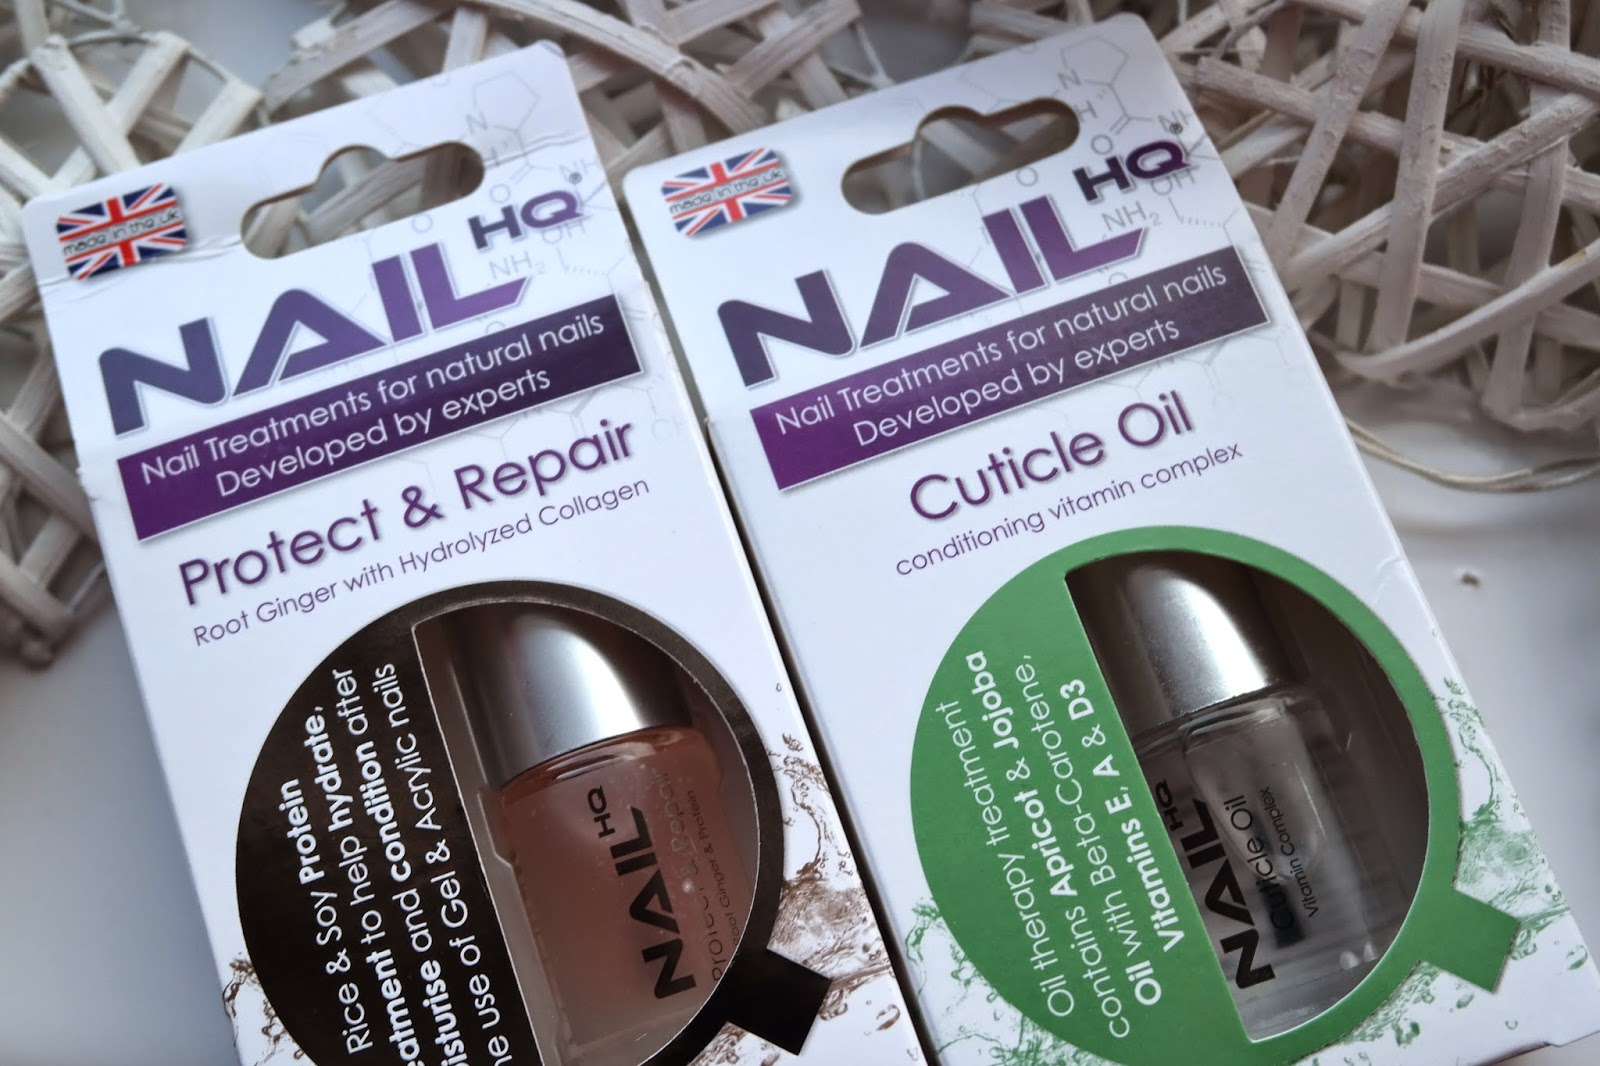 Nail HQ Protect & Repair and Cuticle Oil Review - Jenna Suth